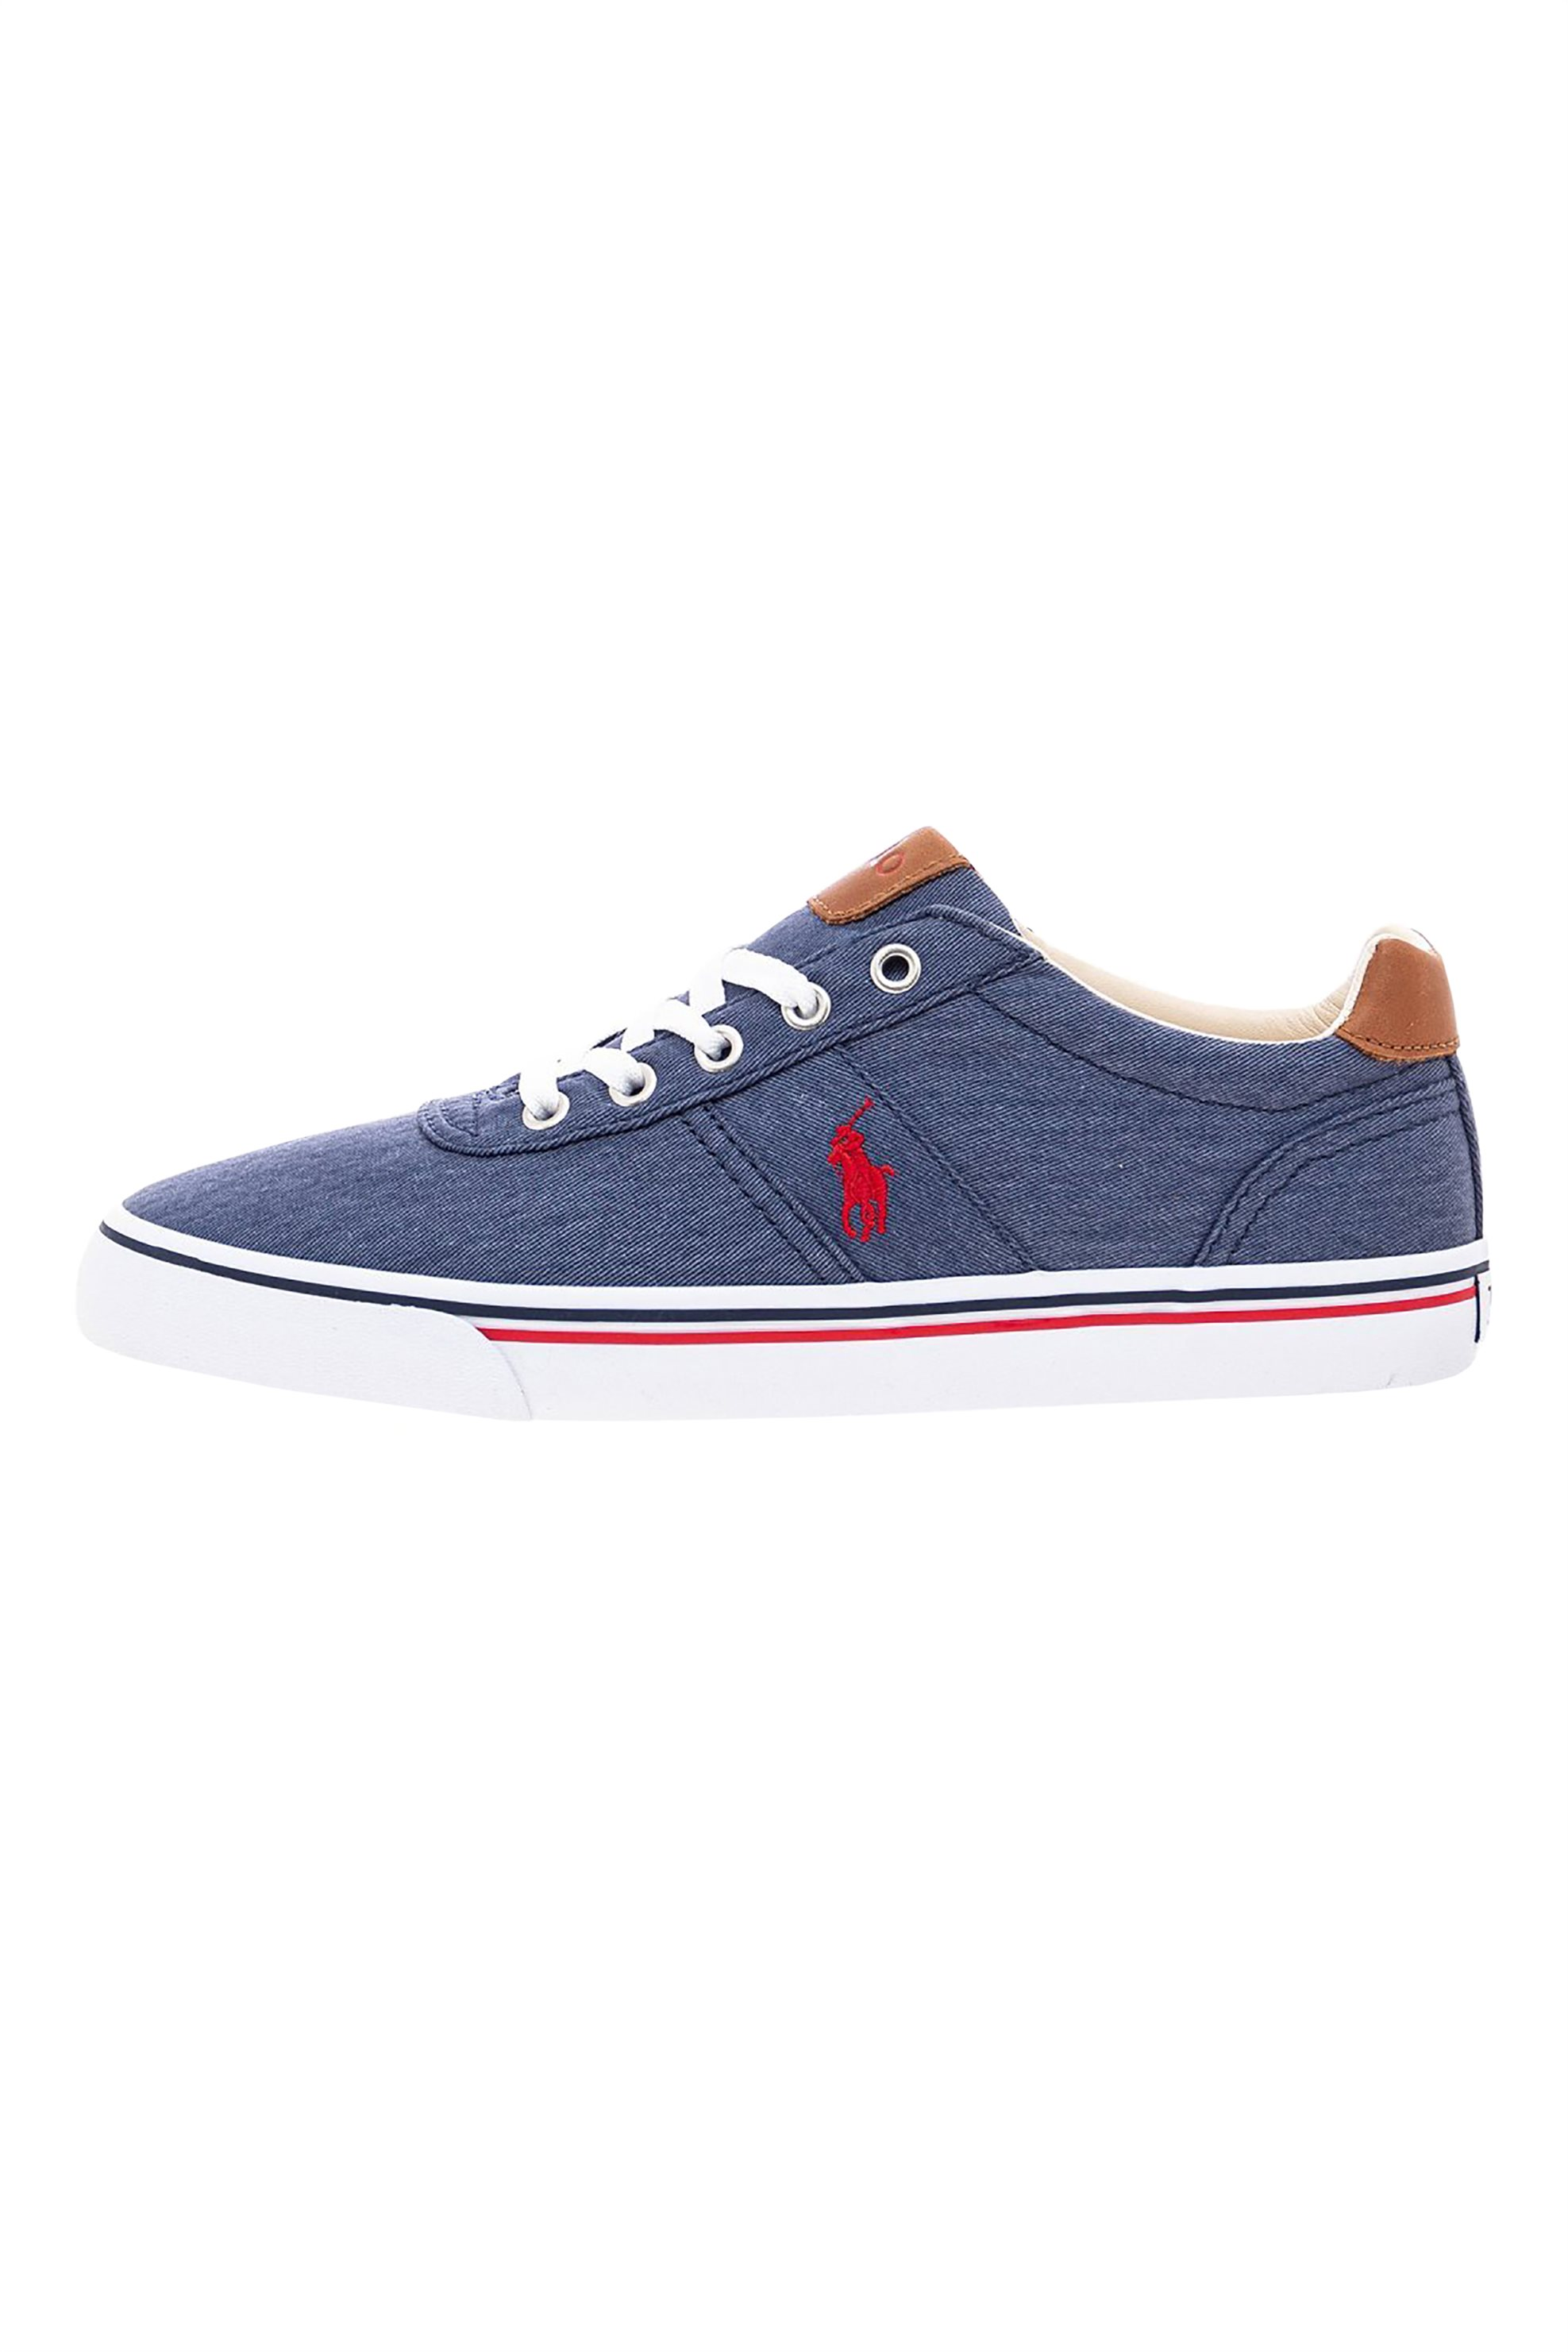 "Polo Ralph Lauren ανδρικά denim sneakers με κεντημένο logo ""Hanford"" – 816786047001 – Μπλε Σκούρο"